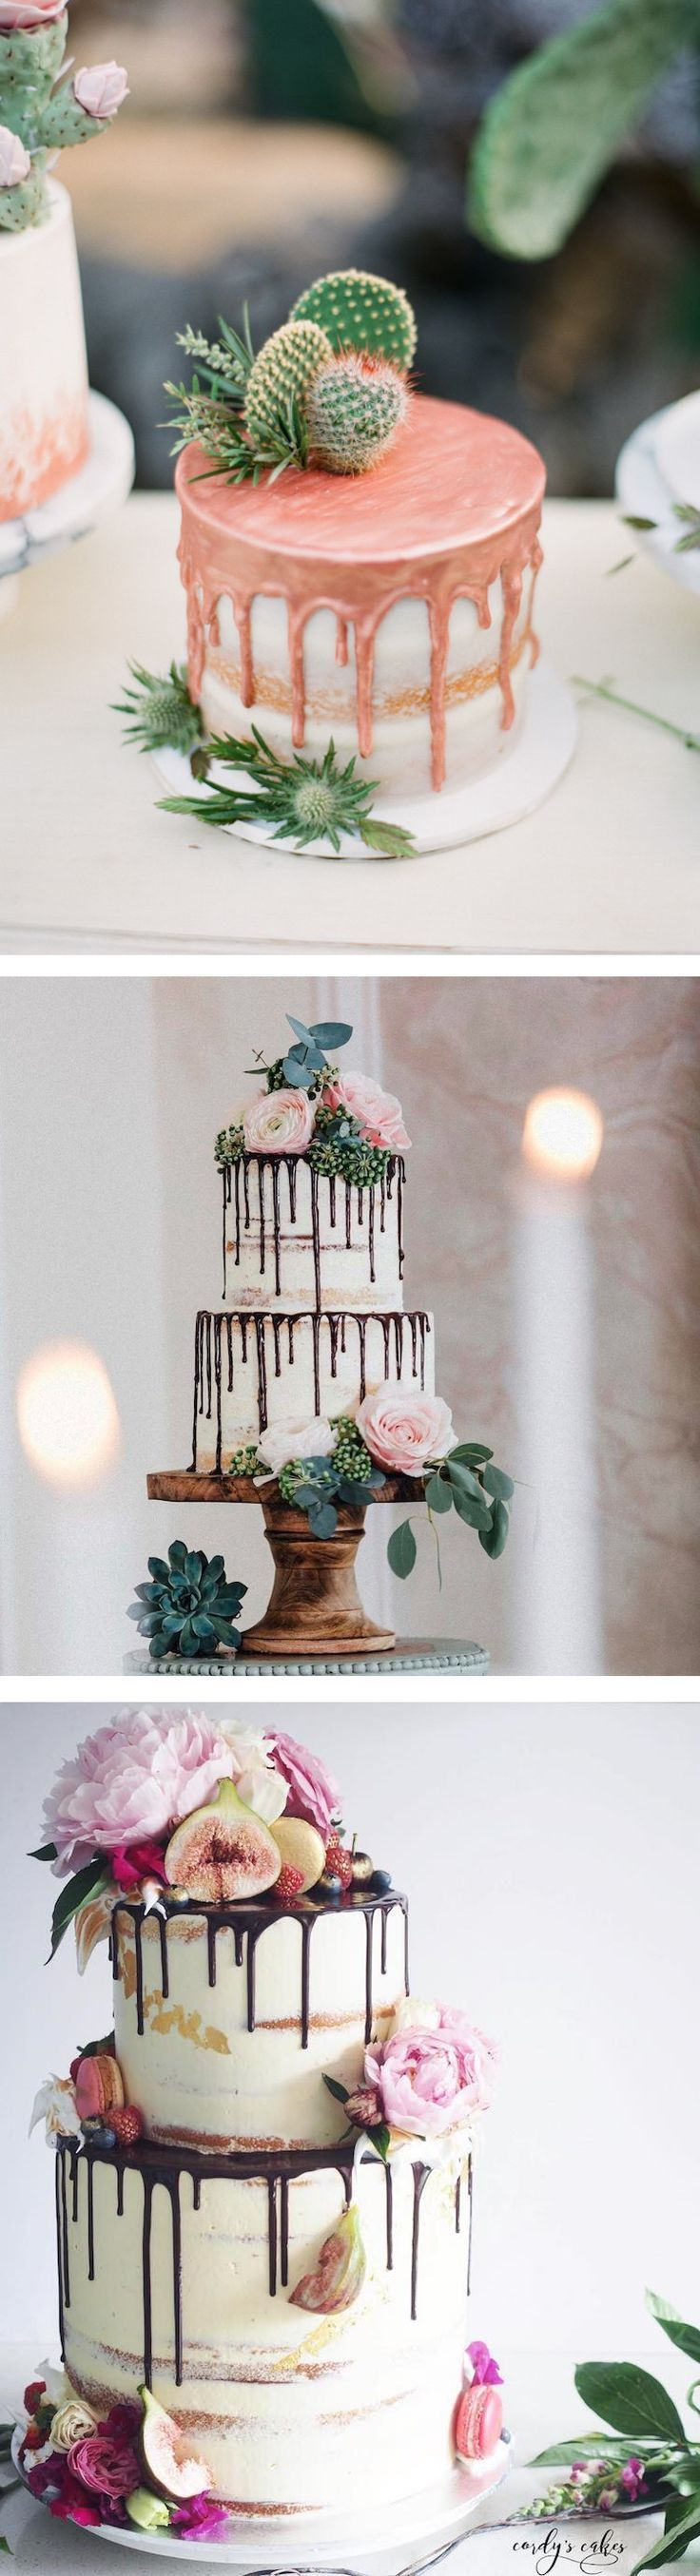 Drip cake // cake inspo // cake ideas // cake decorating ideas // cake trends